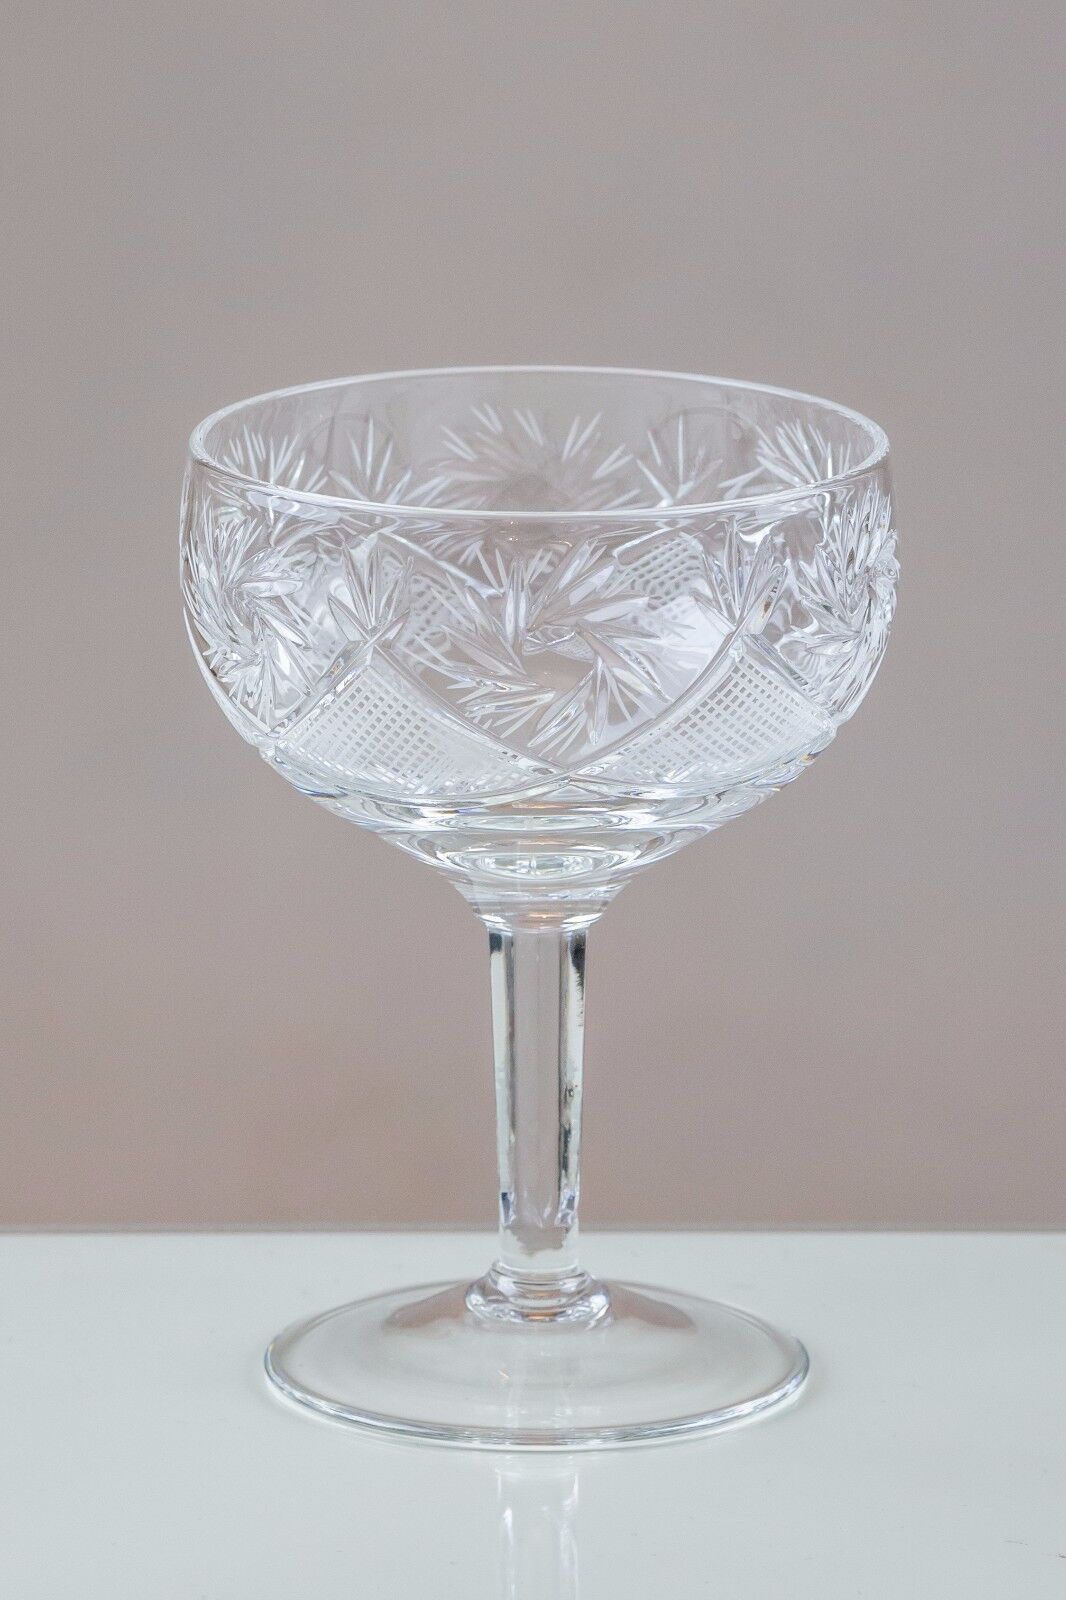 Thistledown 6 Coupe Platillos Champagne Cristal De Plomo 24% 100% hecho a mano